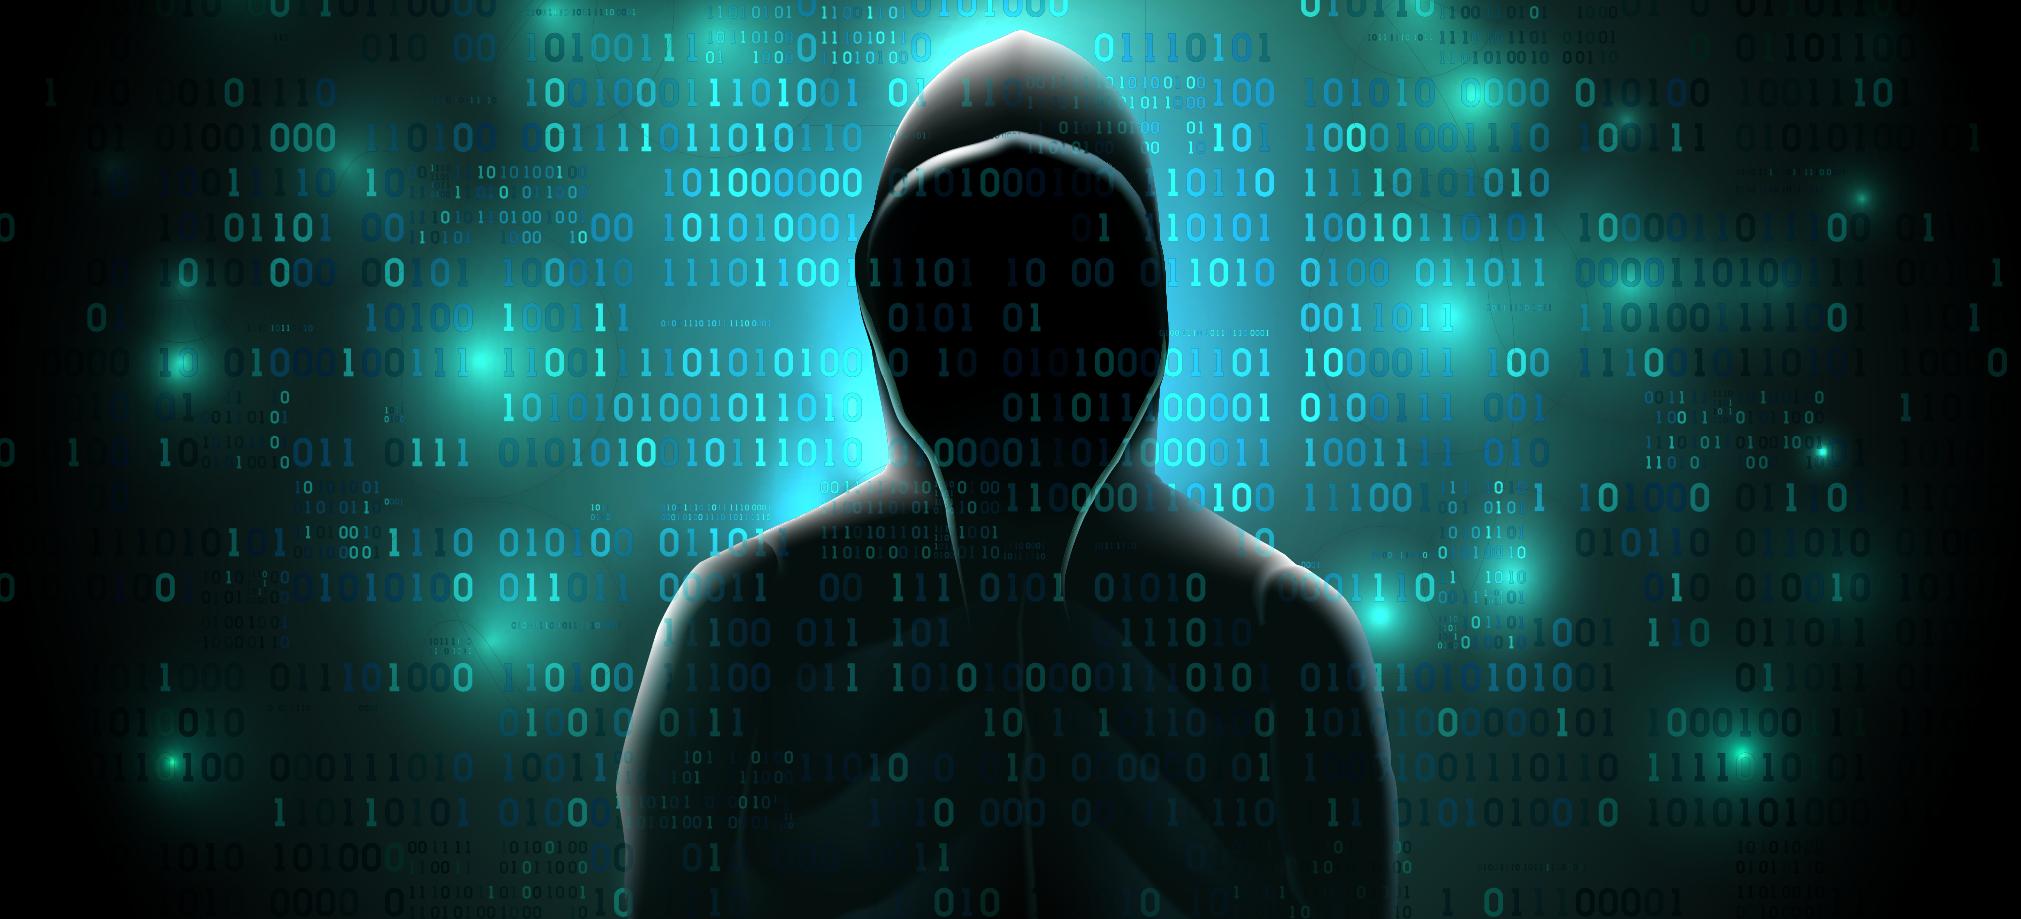 https: img.okezone.com content 2019 05 19 92 2057607 4-tips-agar-smartphone-anda-aman-dari-serangan-hacker-mHYdDkJVot.png